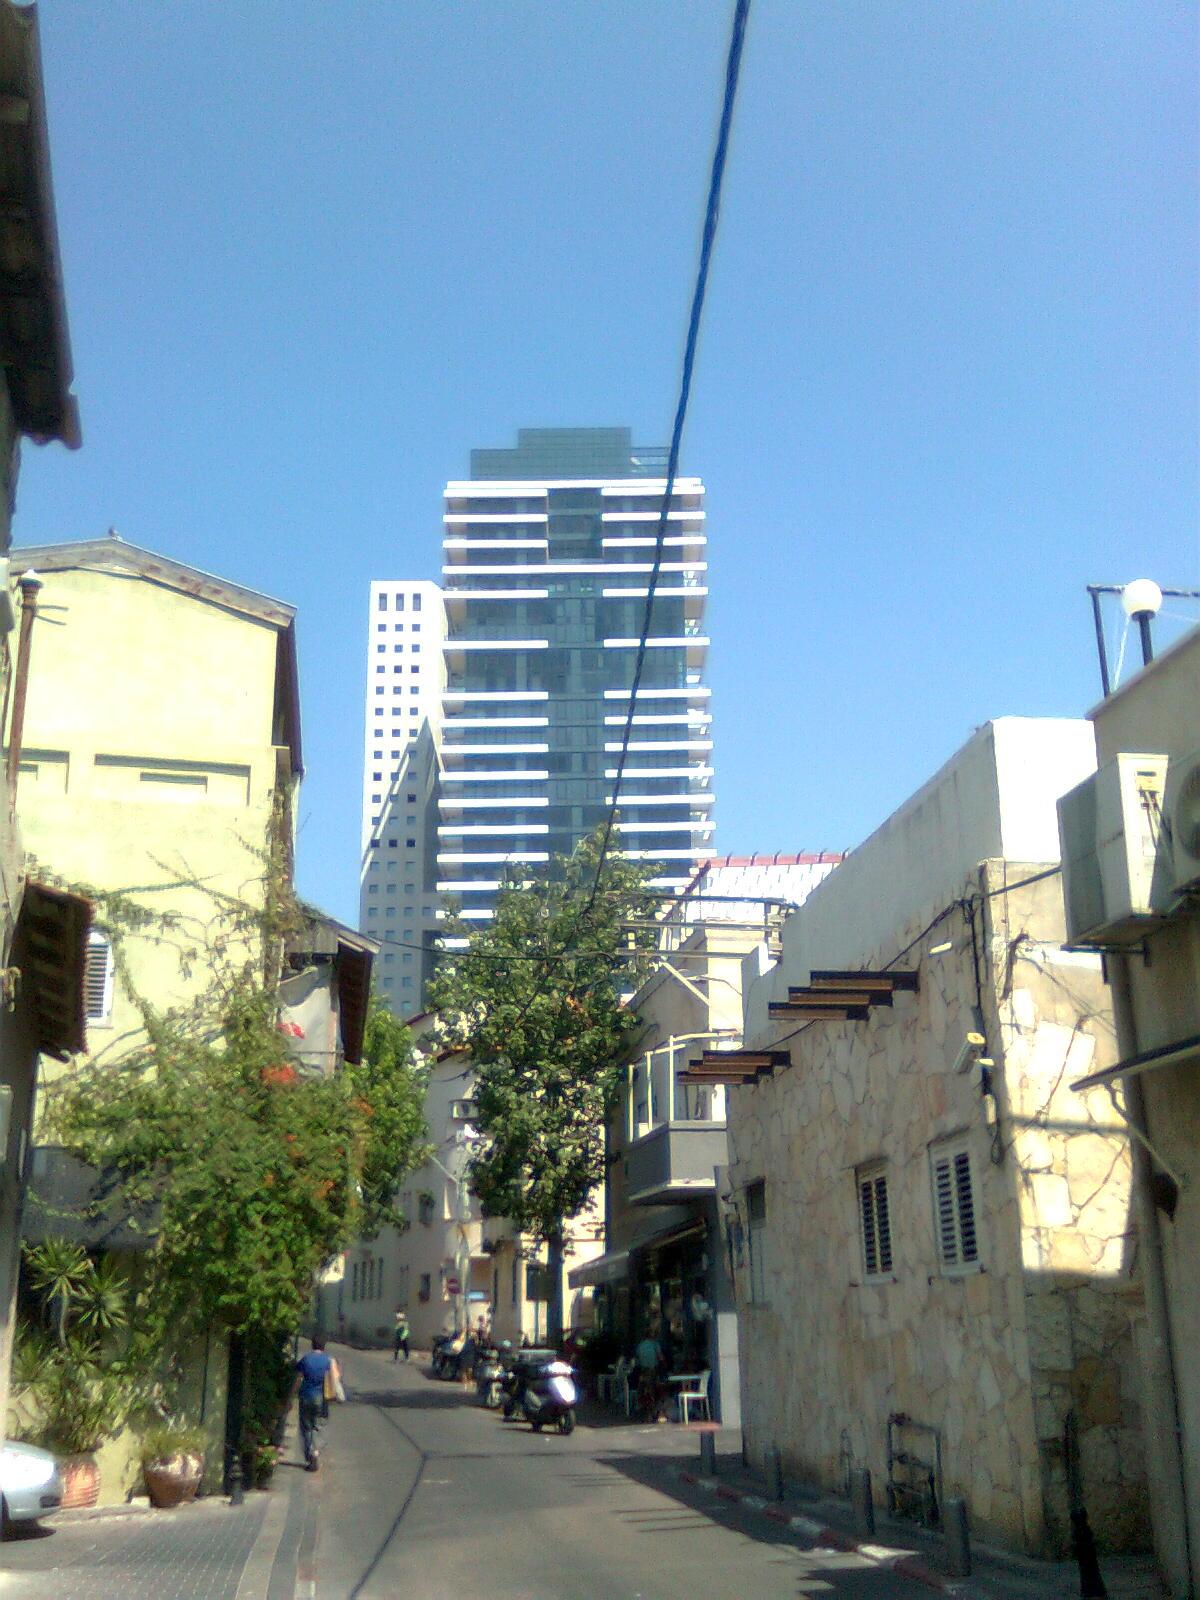 Leben in Jerusalem: November 2011